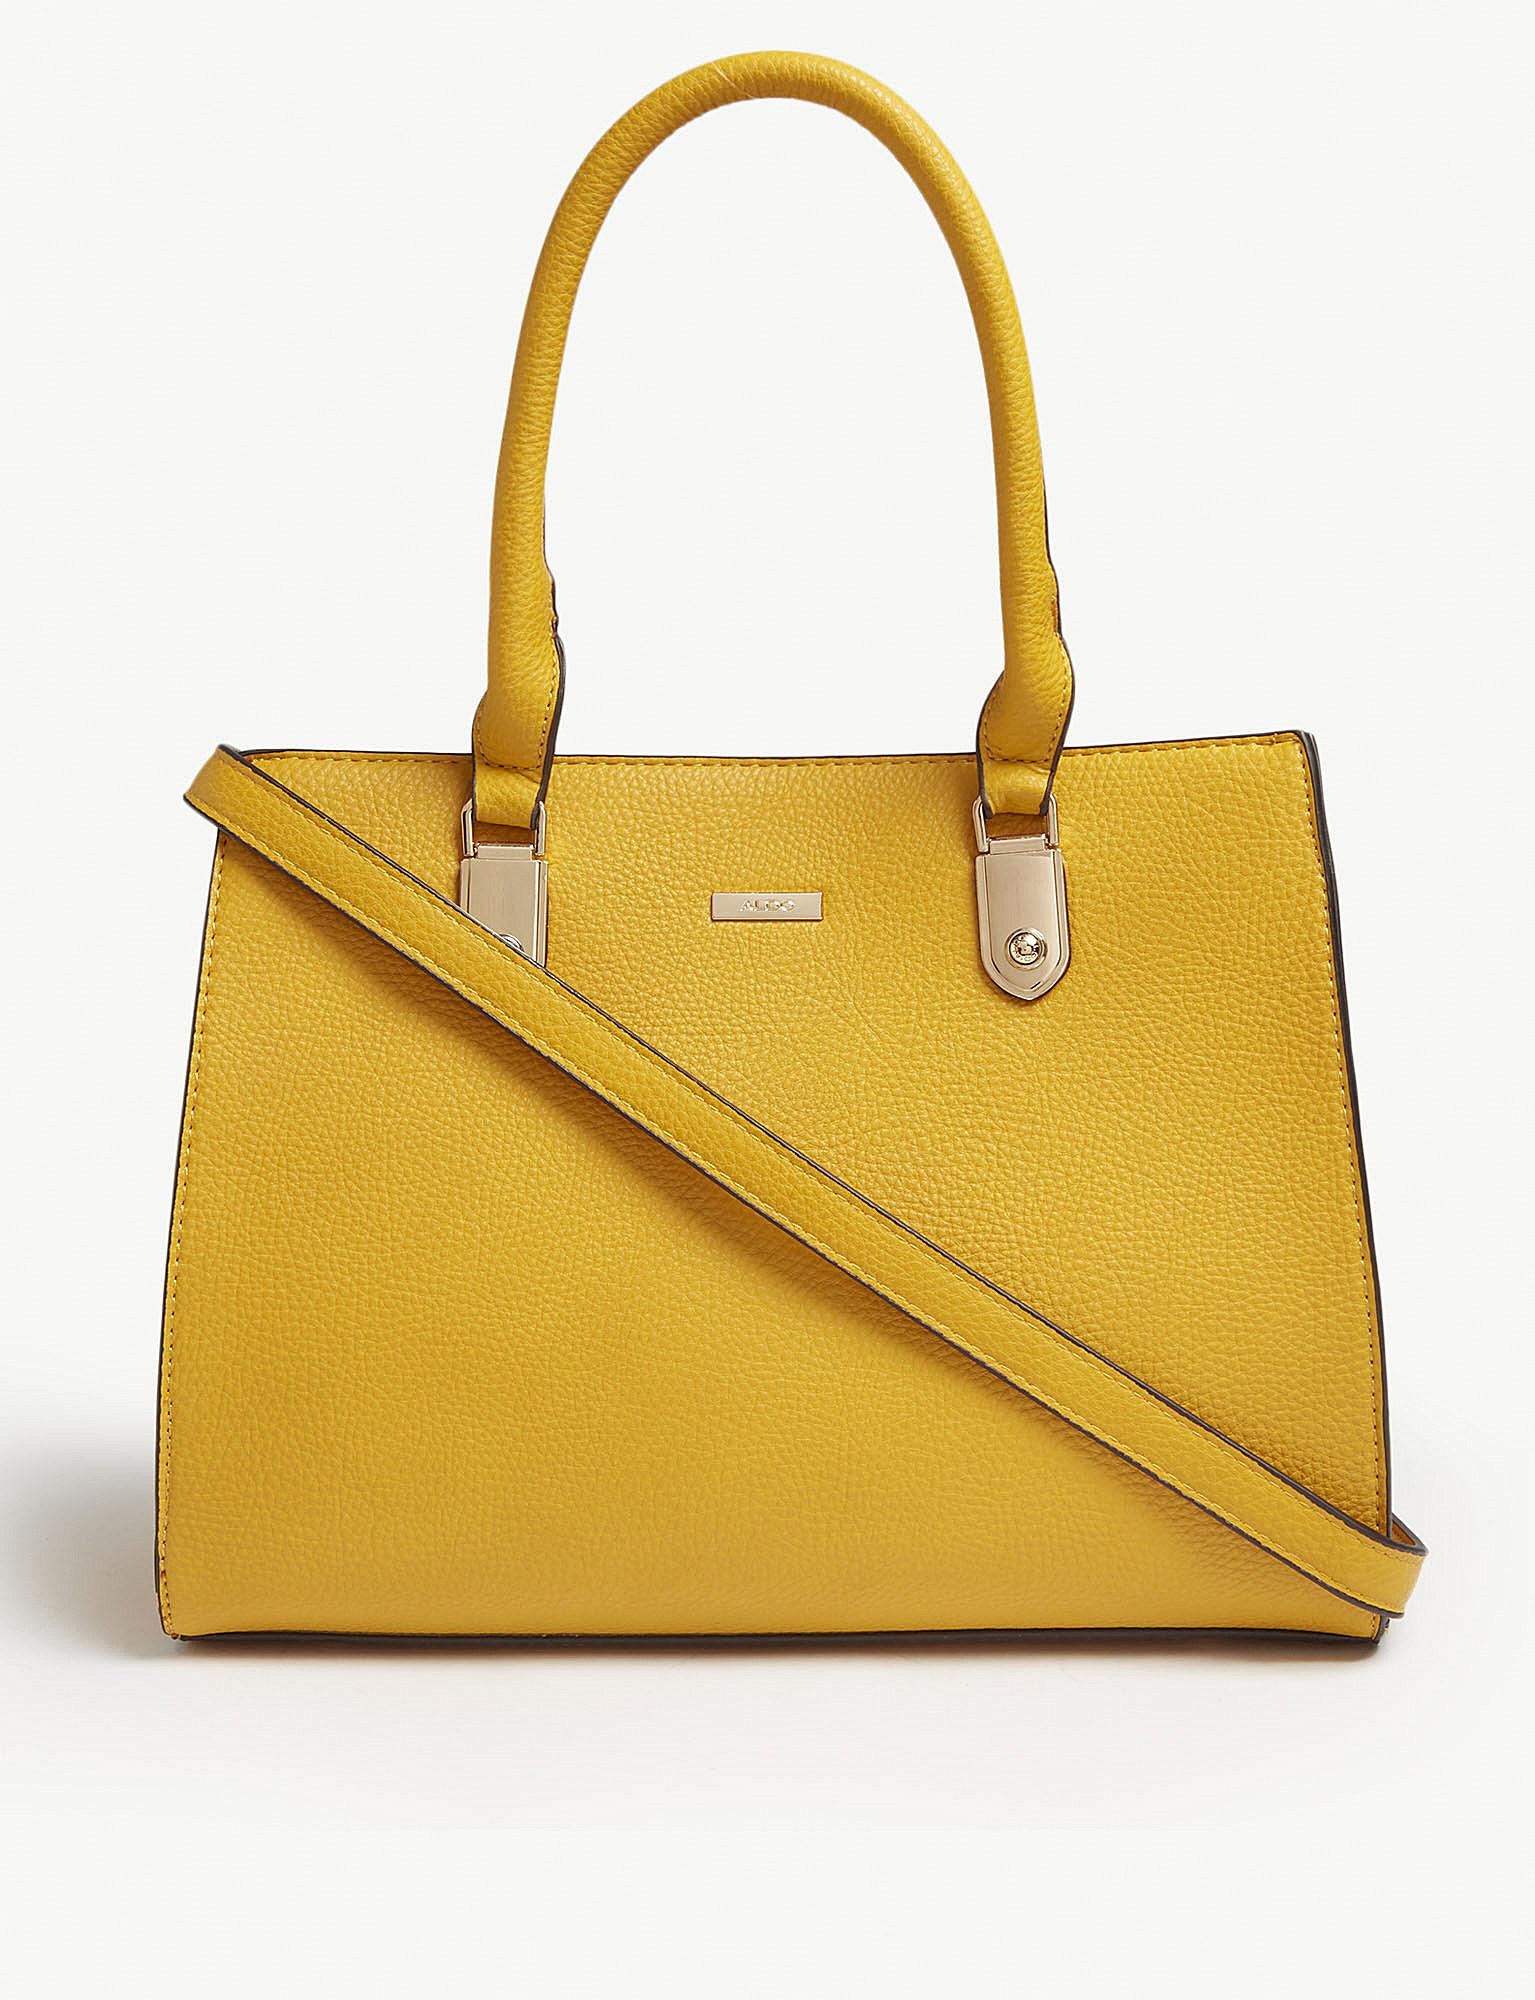 Aldo England Faux-leather Cross-body Bag in Yellow - Lyst 5534f10357f9b